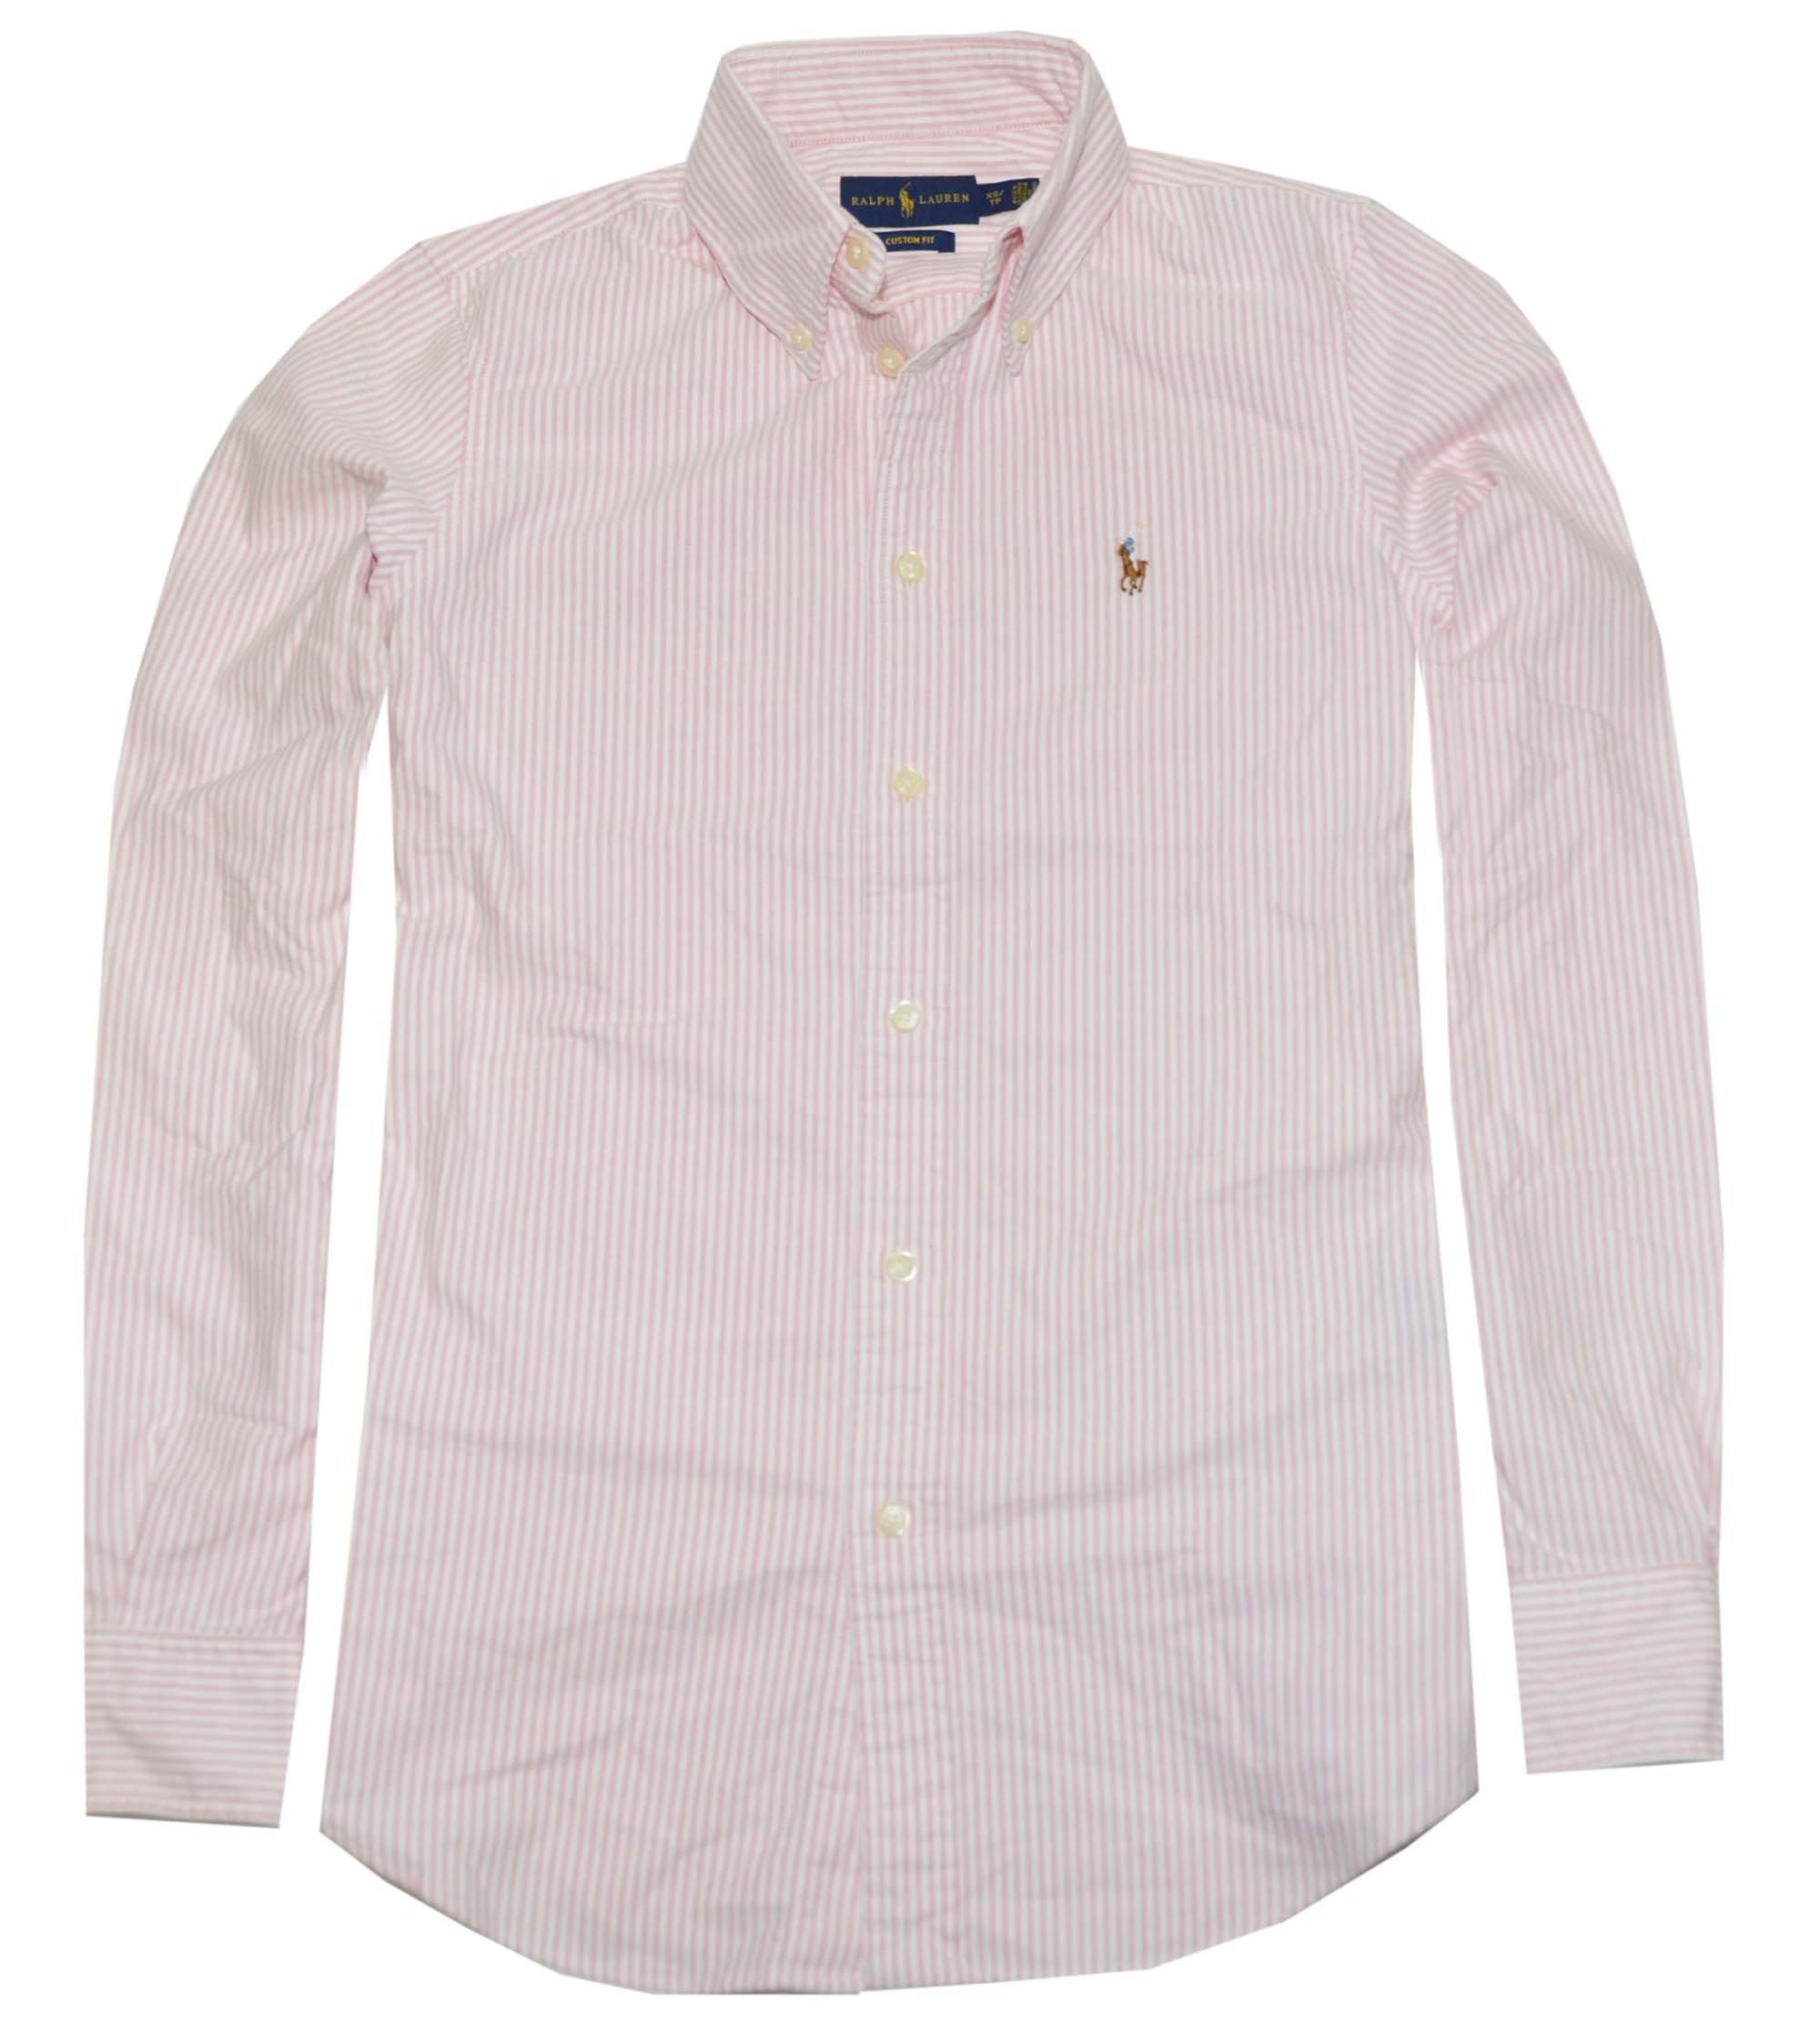 Polo Ralph Lauren Womens Custom Fit Oxford Button Down Shirt (X-Small, BSR Pink/White)